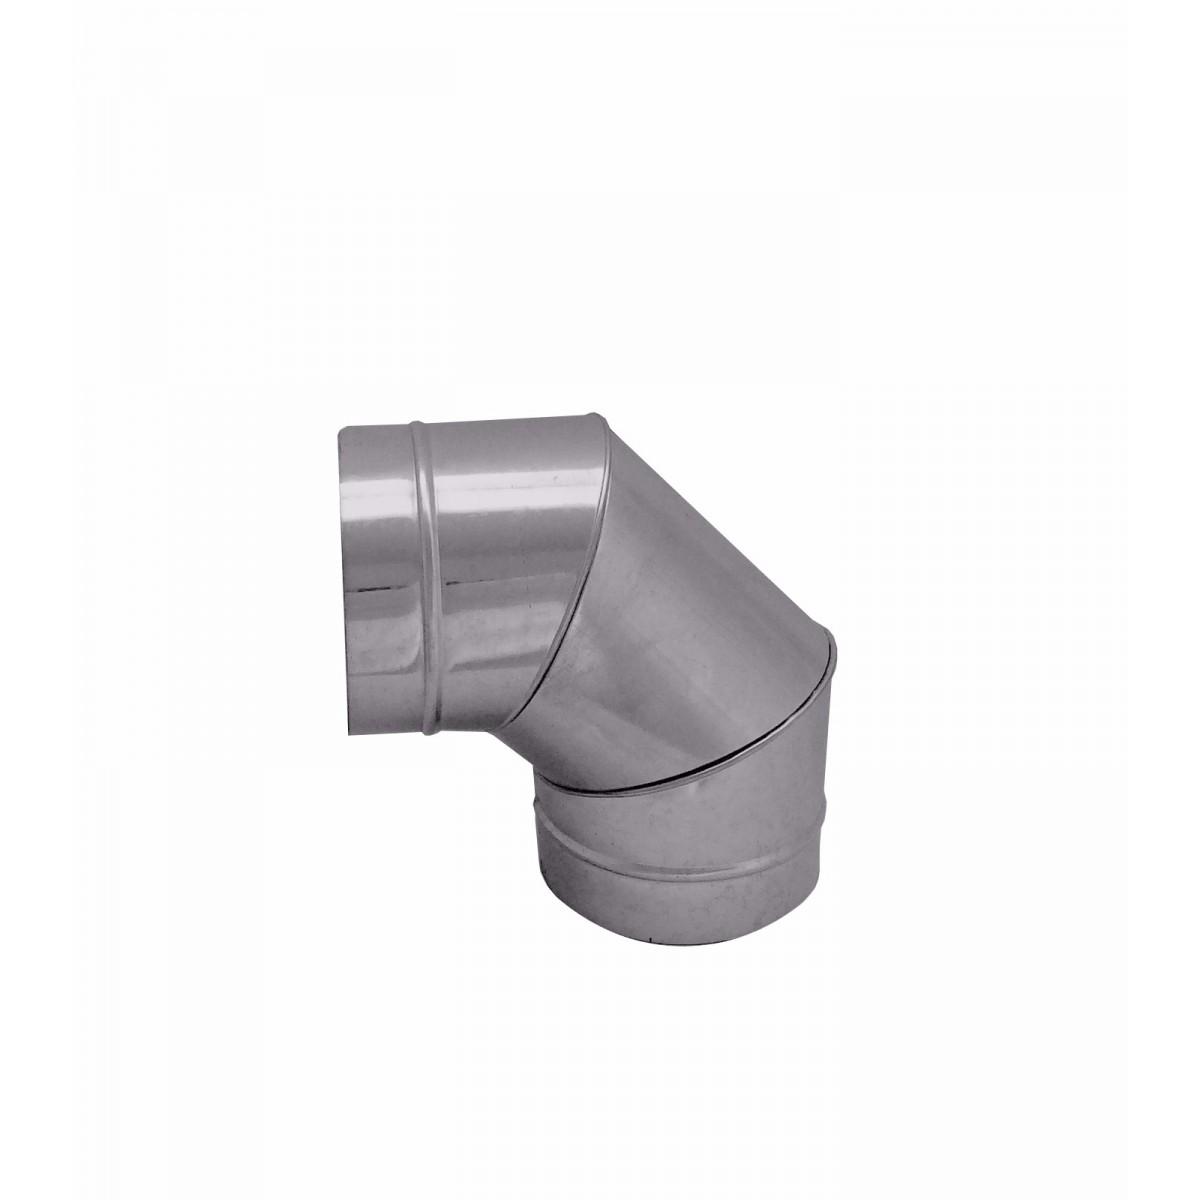 Curva / cotovelo galvanizada 90° de 150 mm de diâmetro  - Galvocalhas